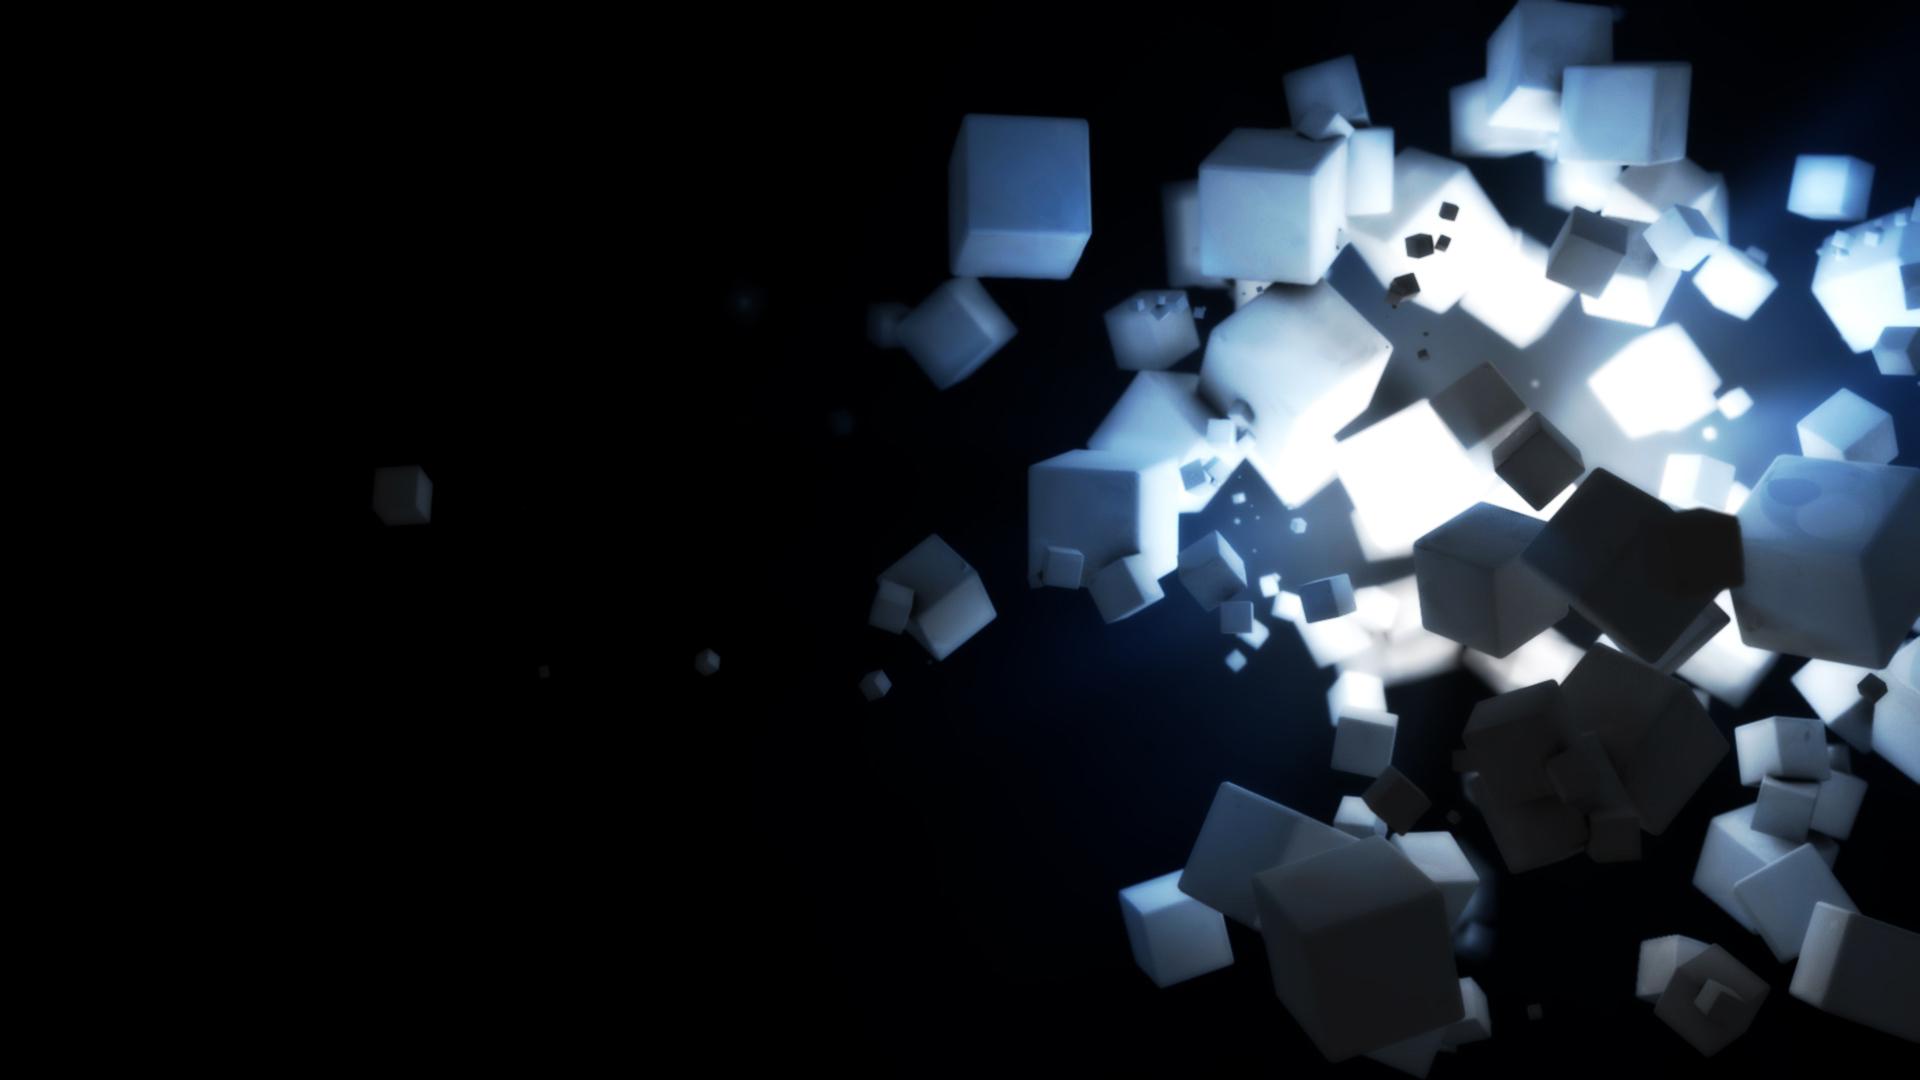 Dark Cubes Wallpapers HD Wallpapers 1920x1080